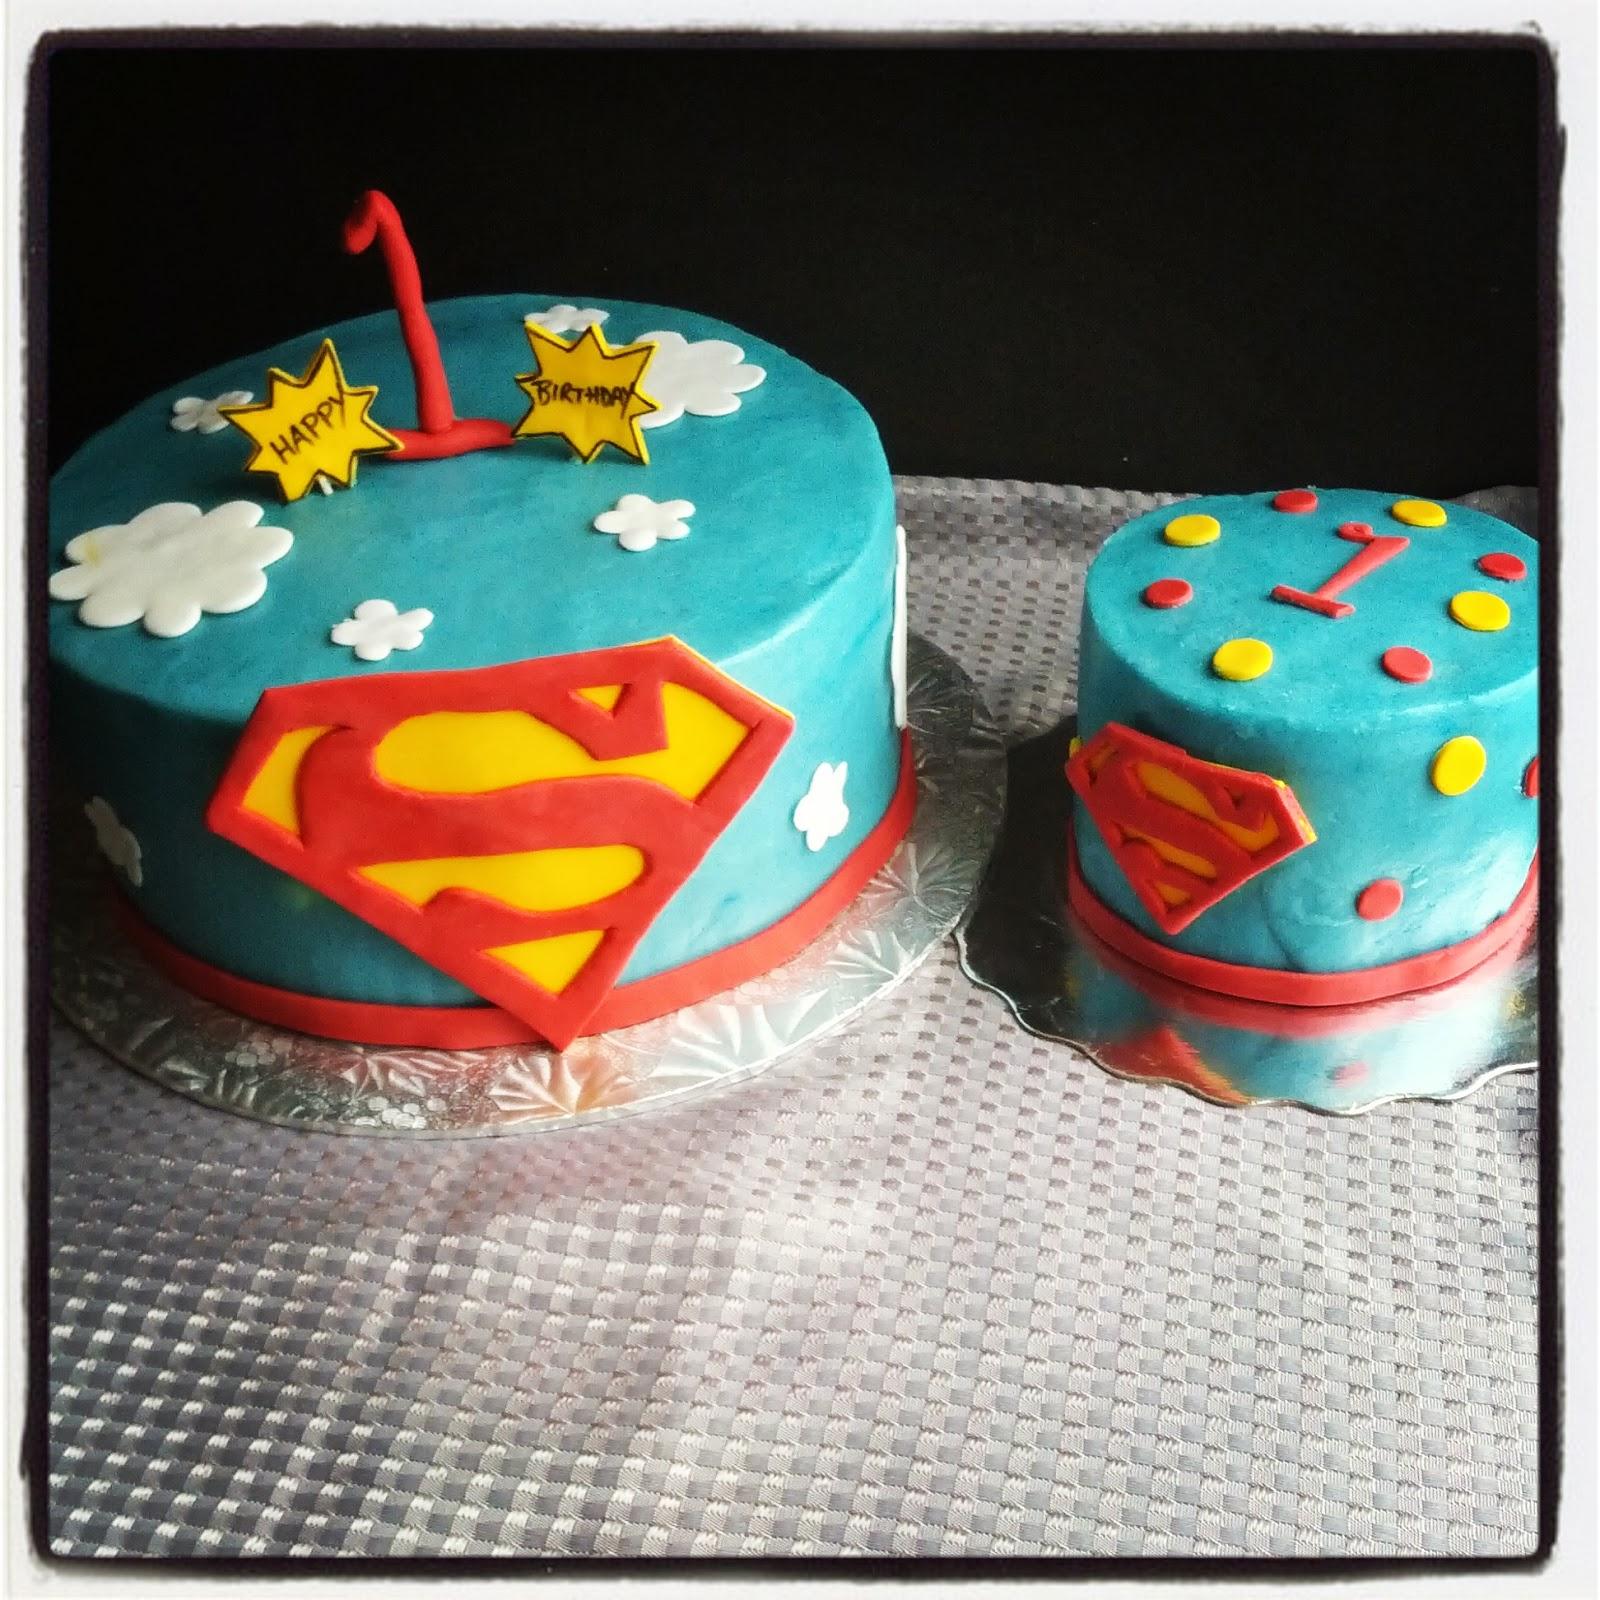 Second Generation Cake Design Superman 1st Birthday Cake